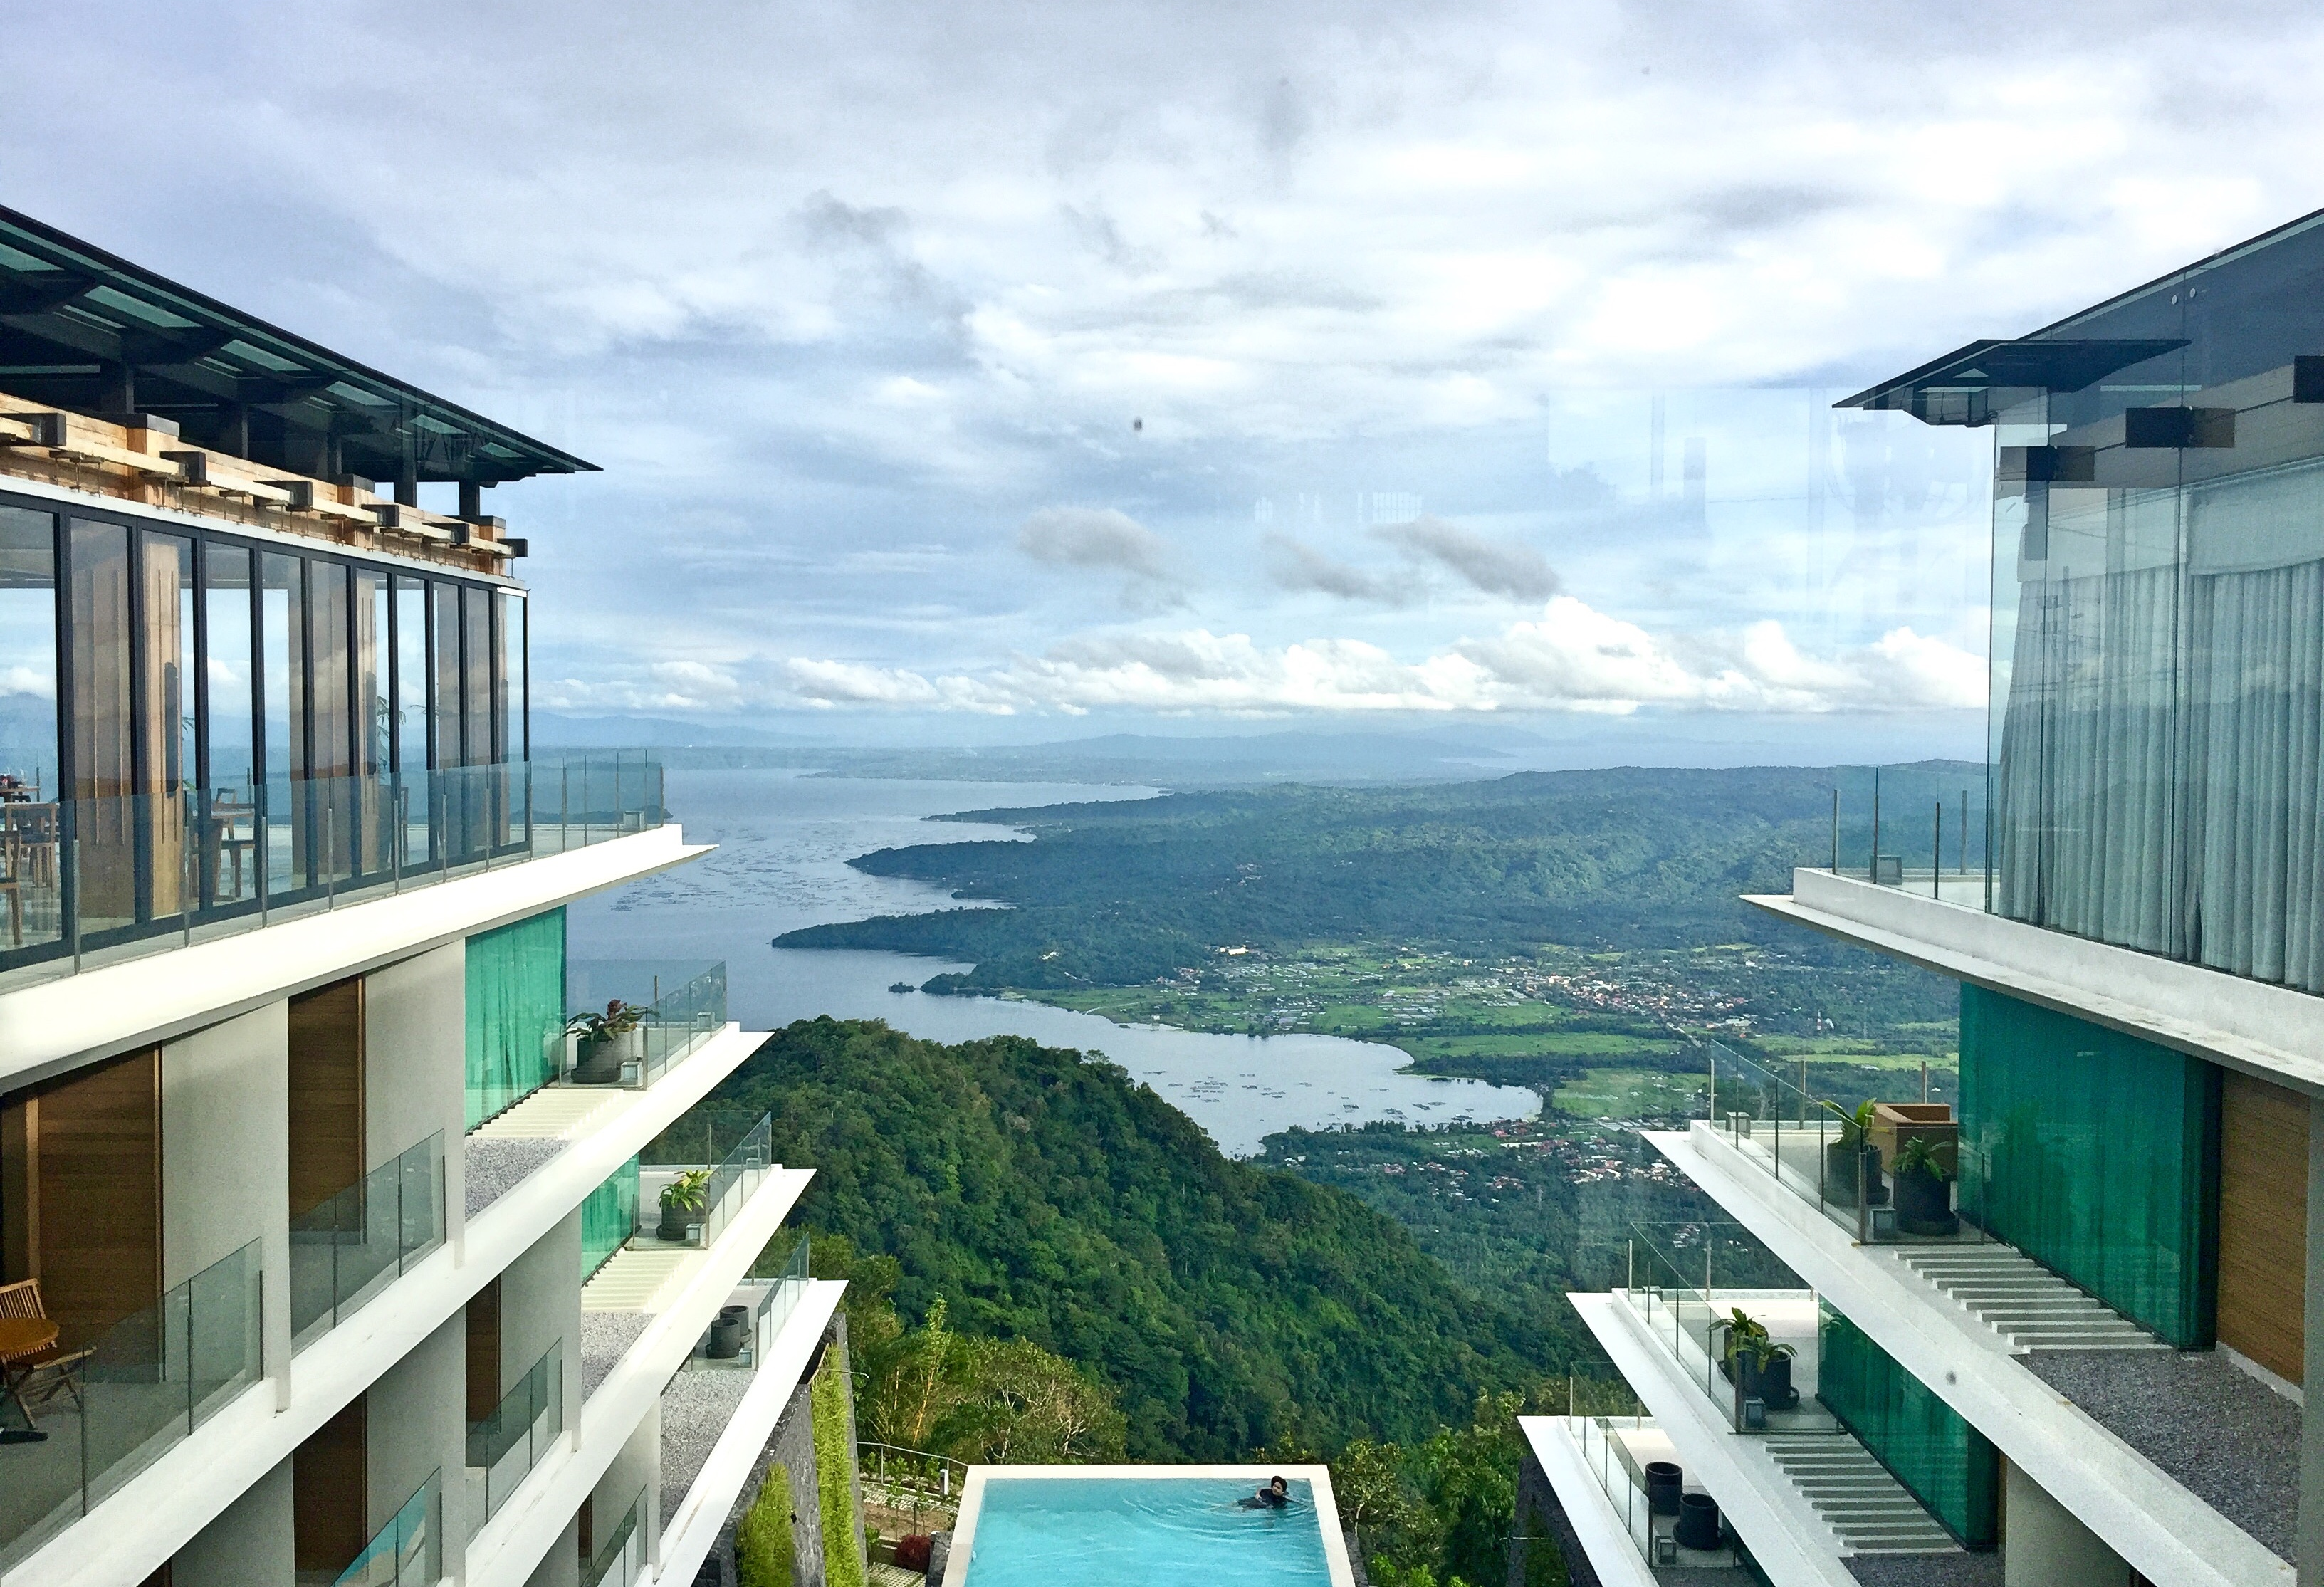 escala hotel in tagaytay - Lindsay blogueuse